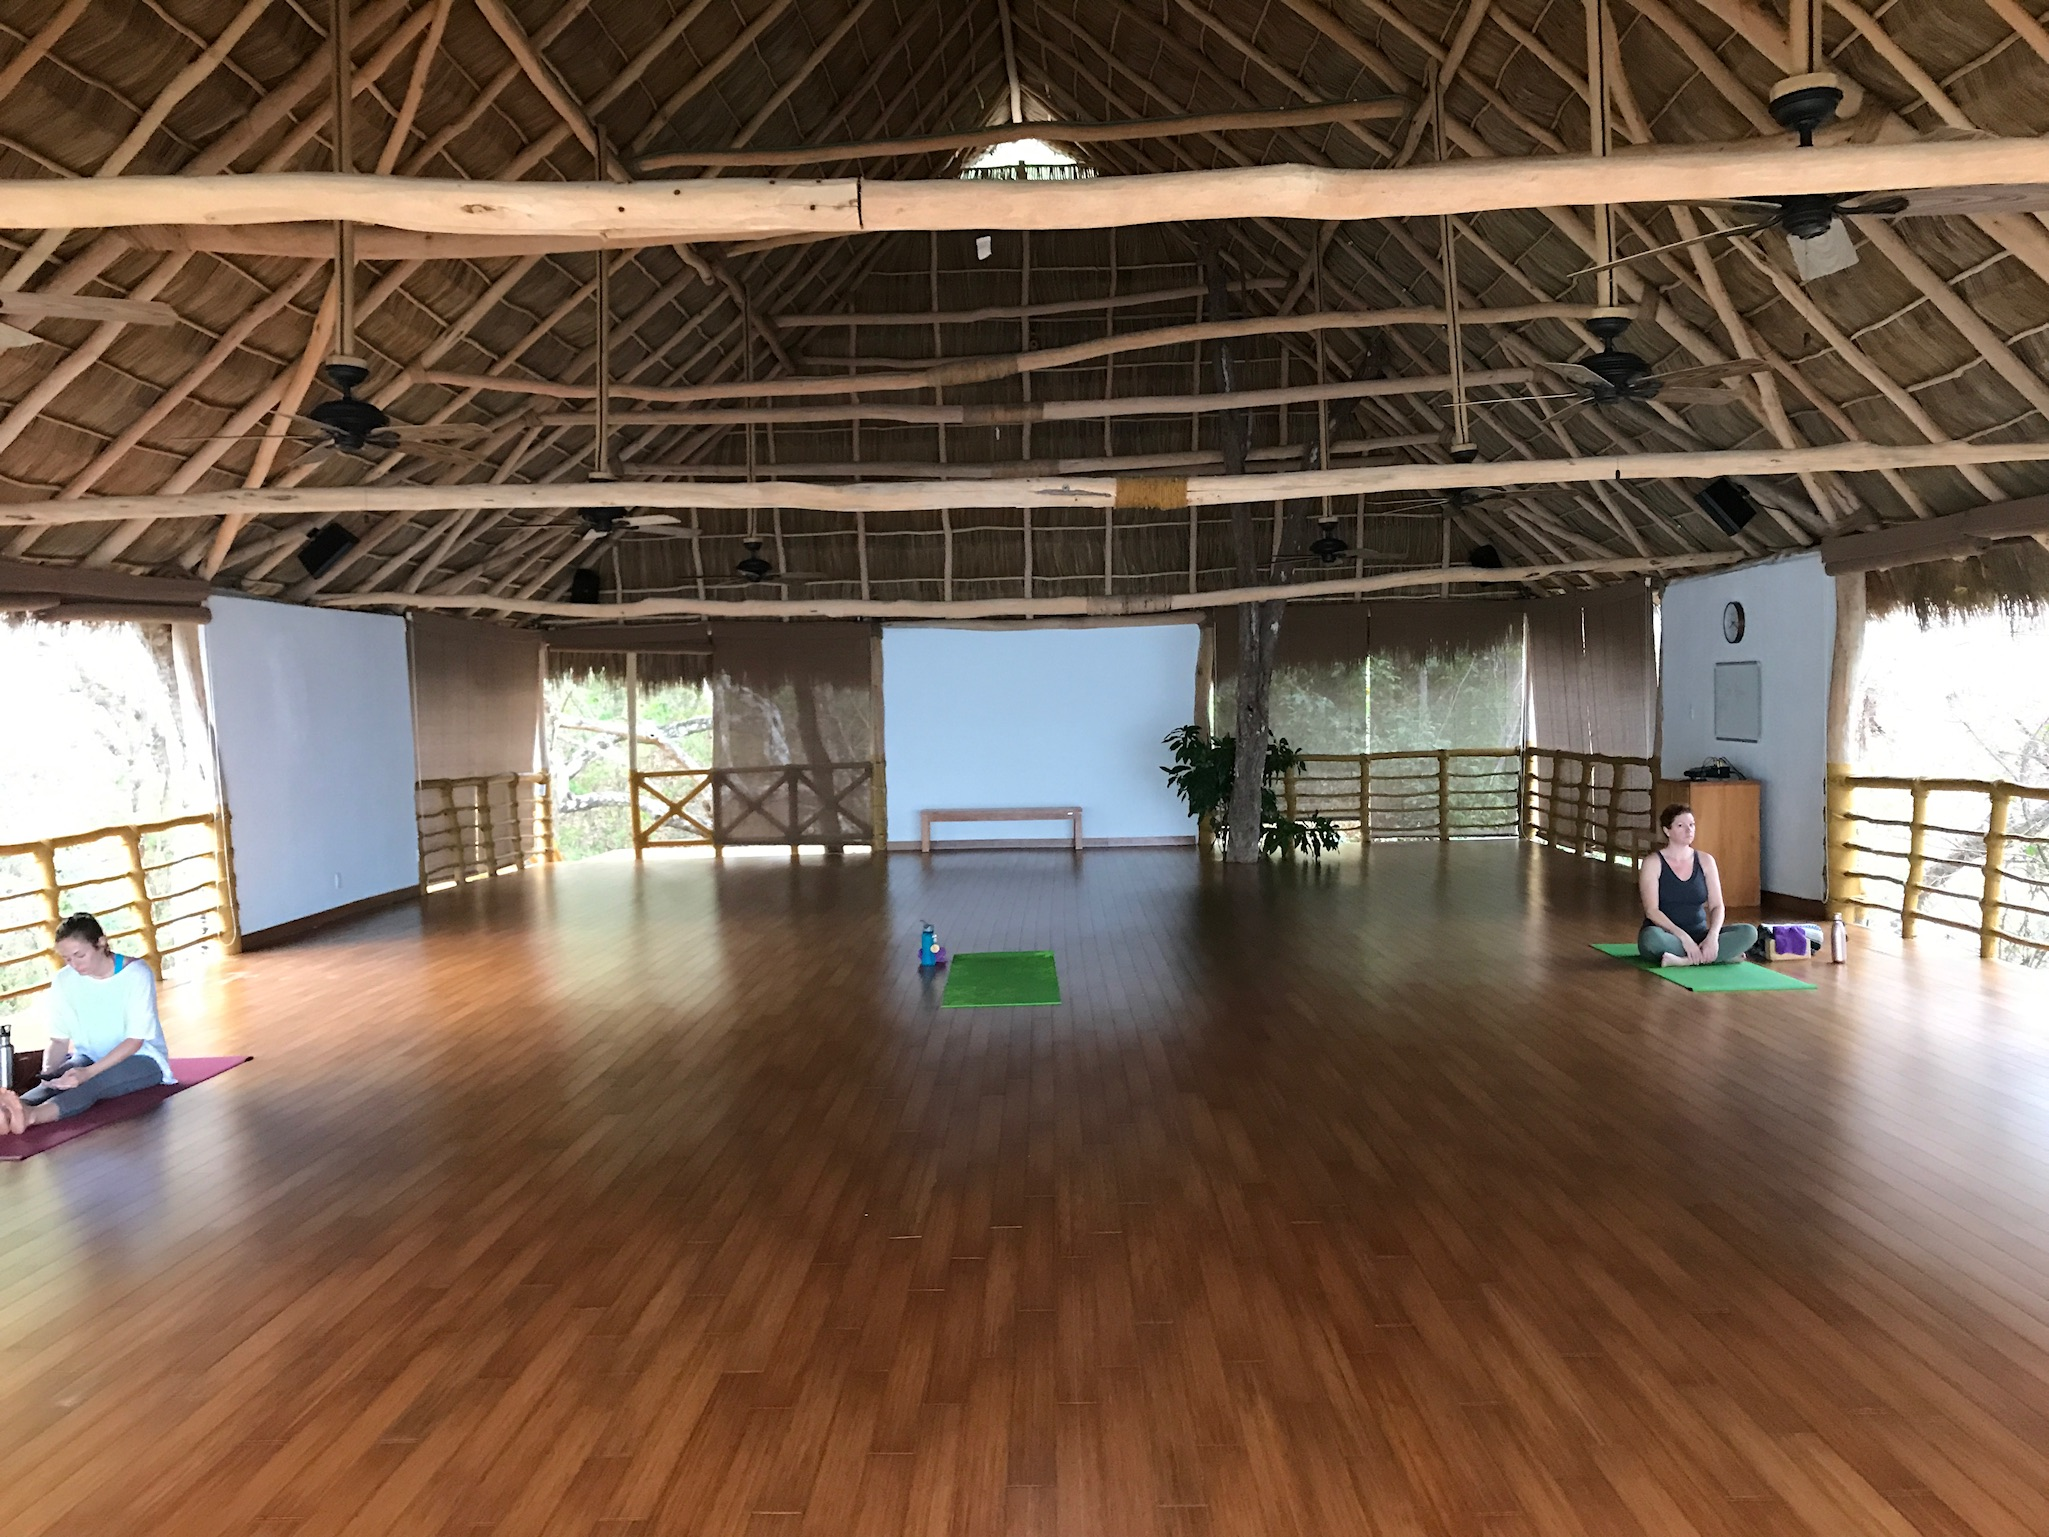 Also the Jungle Studio where yoga classes can be held.